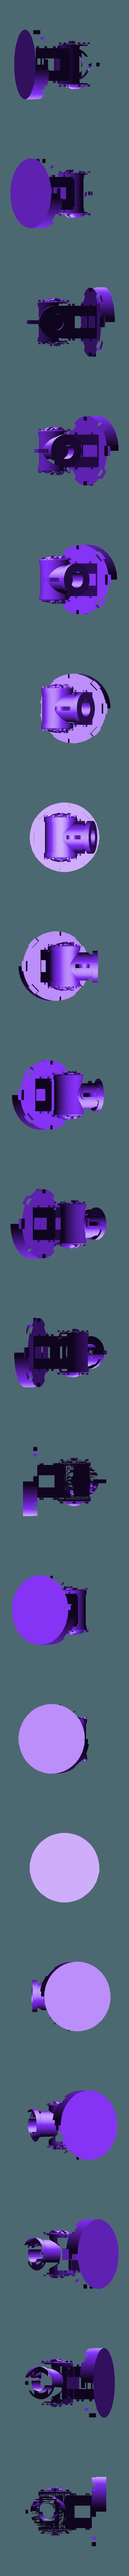 Aztec_Armiger_arm.stl Download free STL file Aztec Armor Bearer  - Conversion Kit • Model to 3D print, ErikTheHeretek